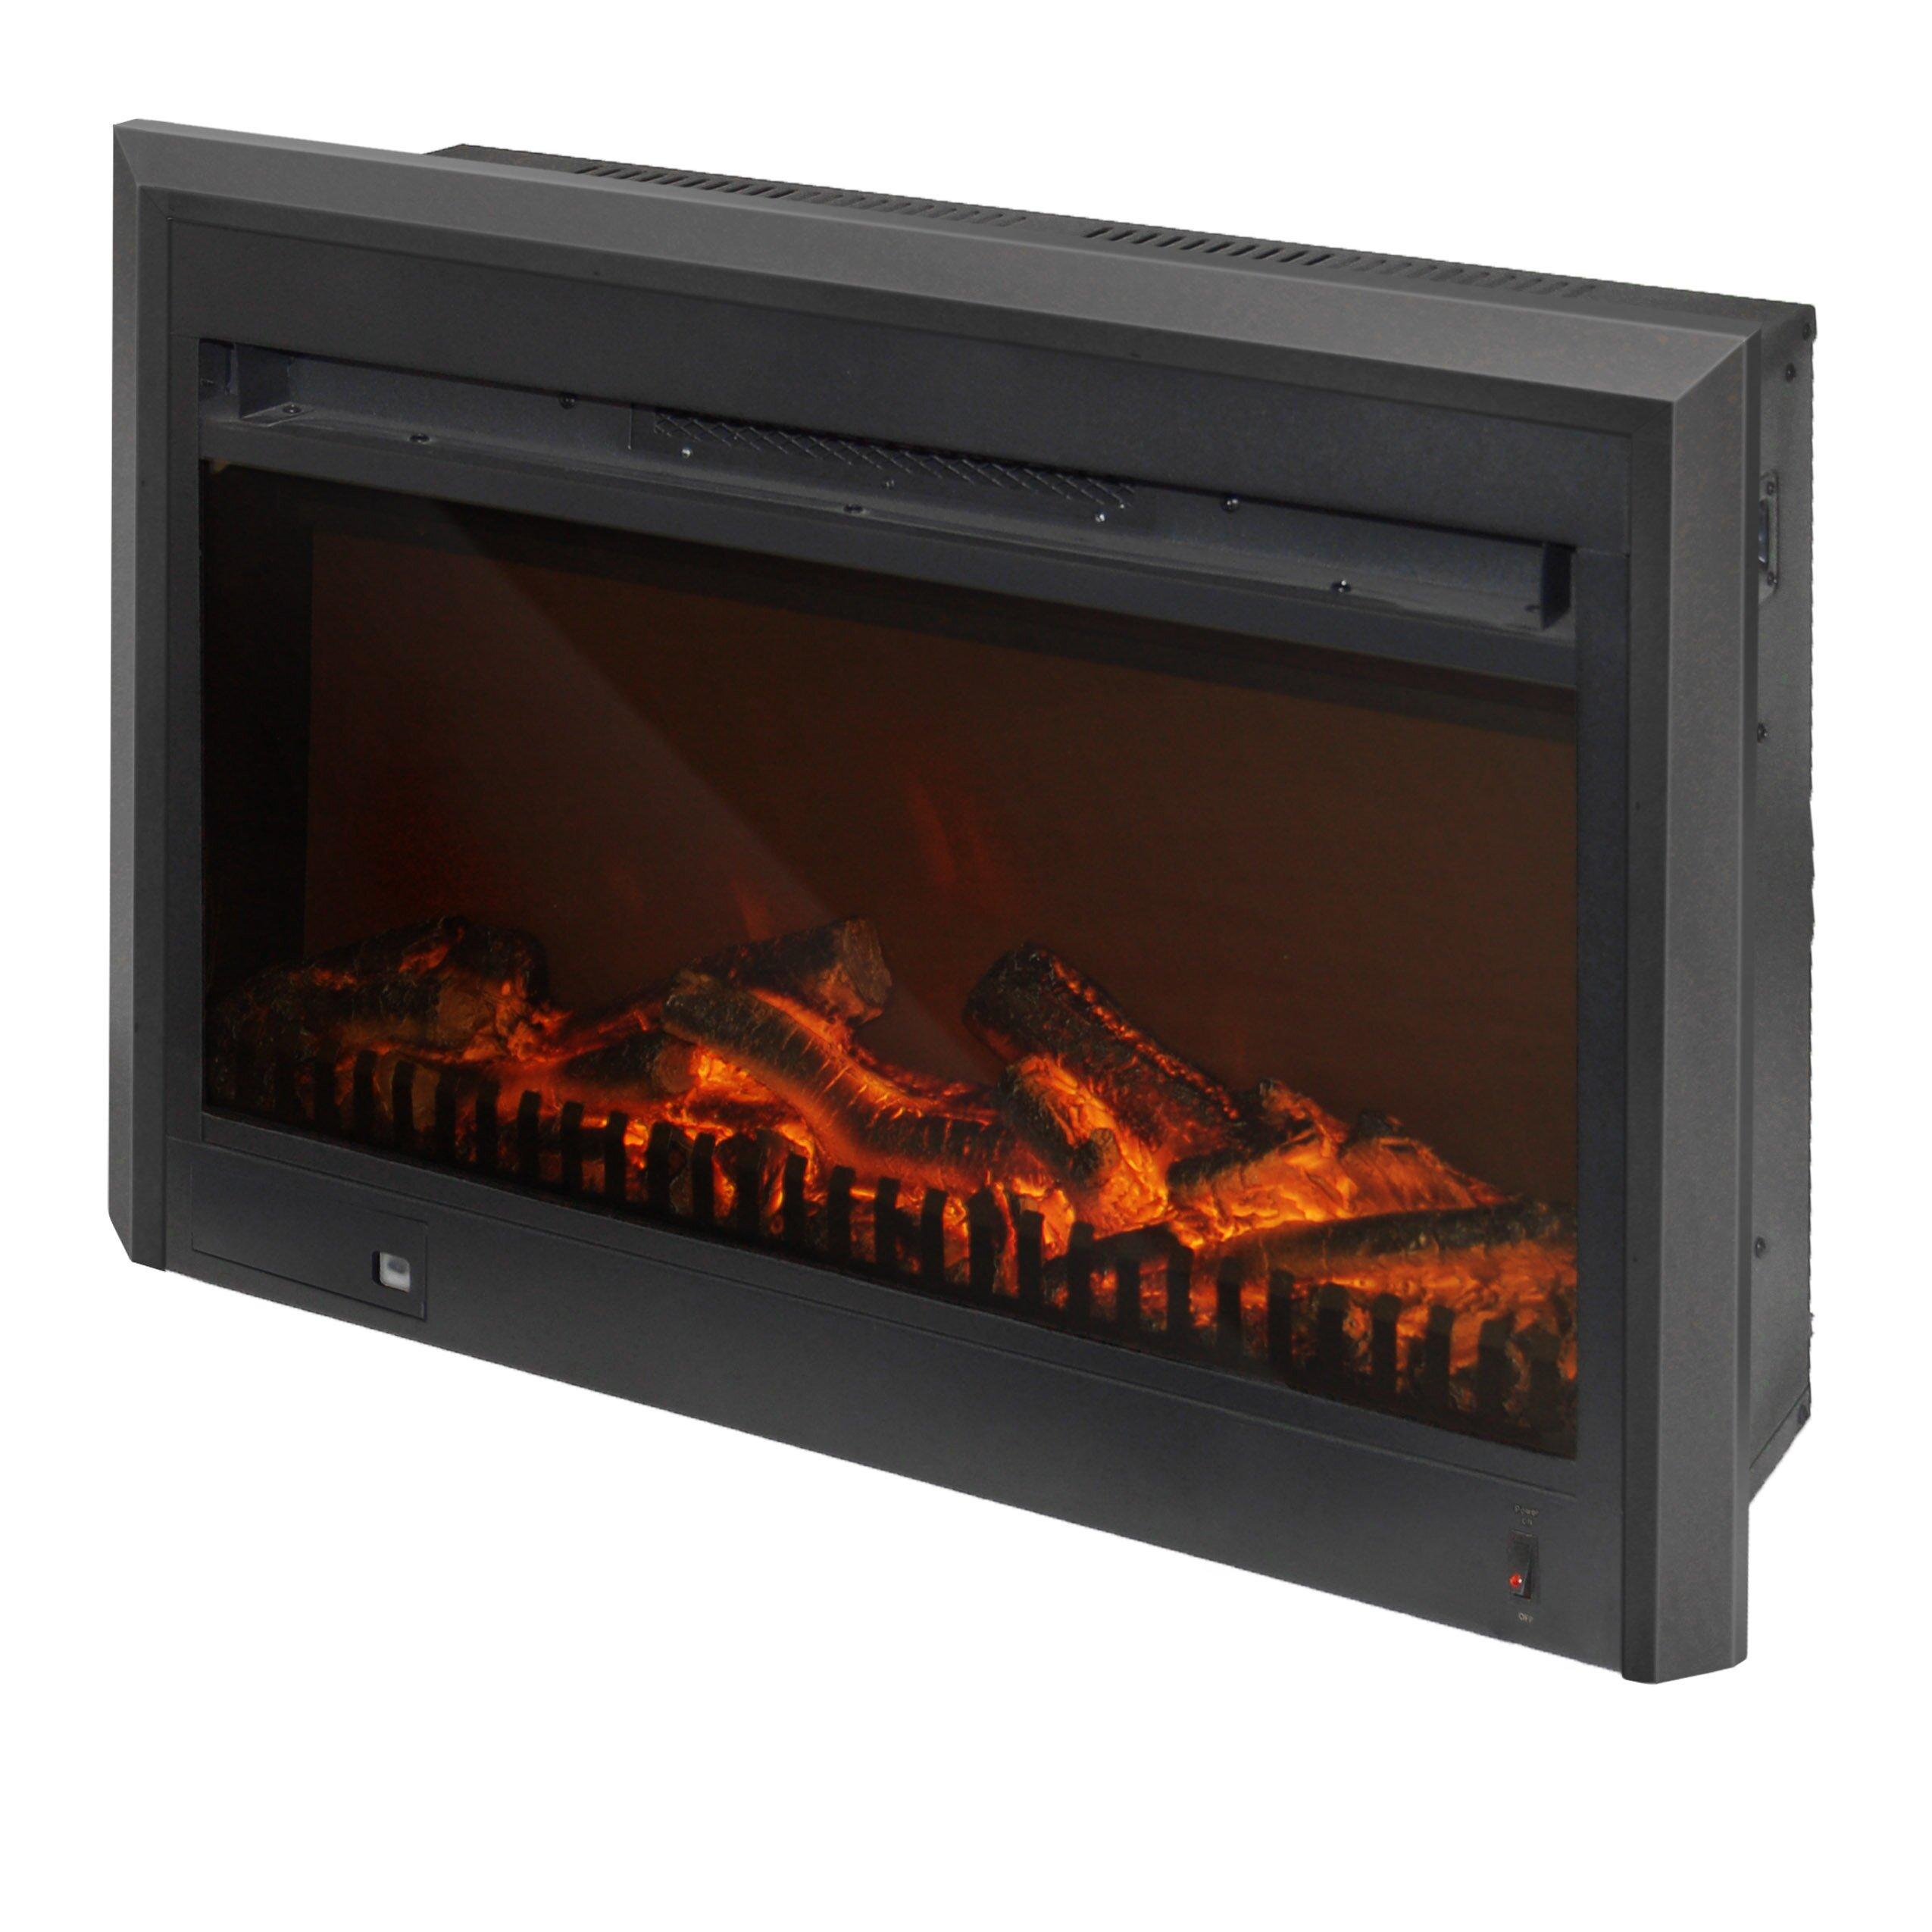 Corliving Electric Fireplace Insert Reviews Wayfair